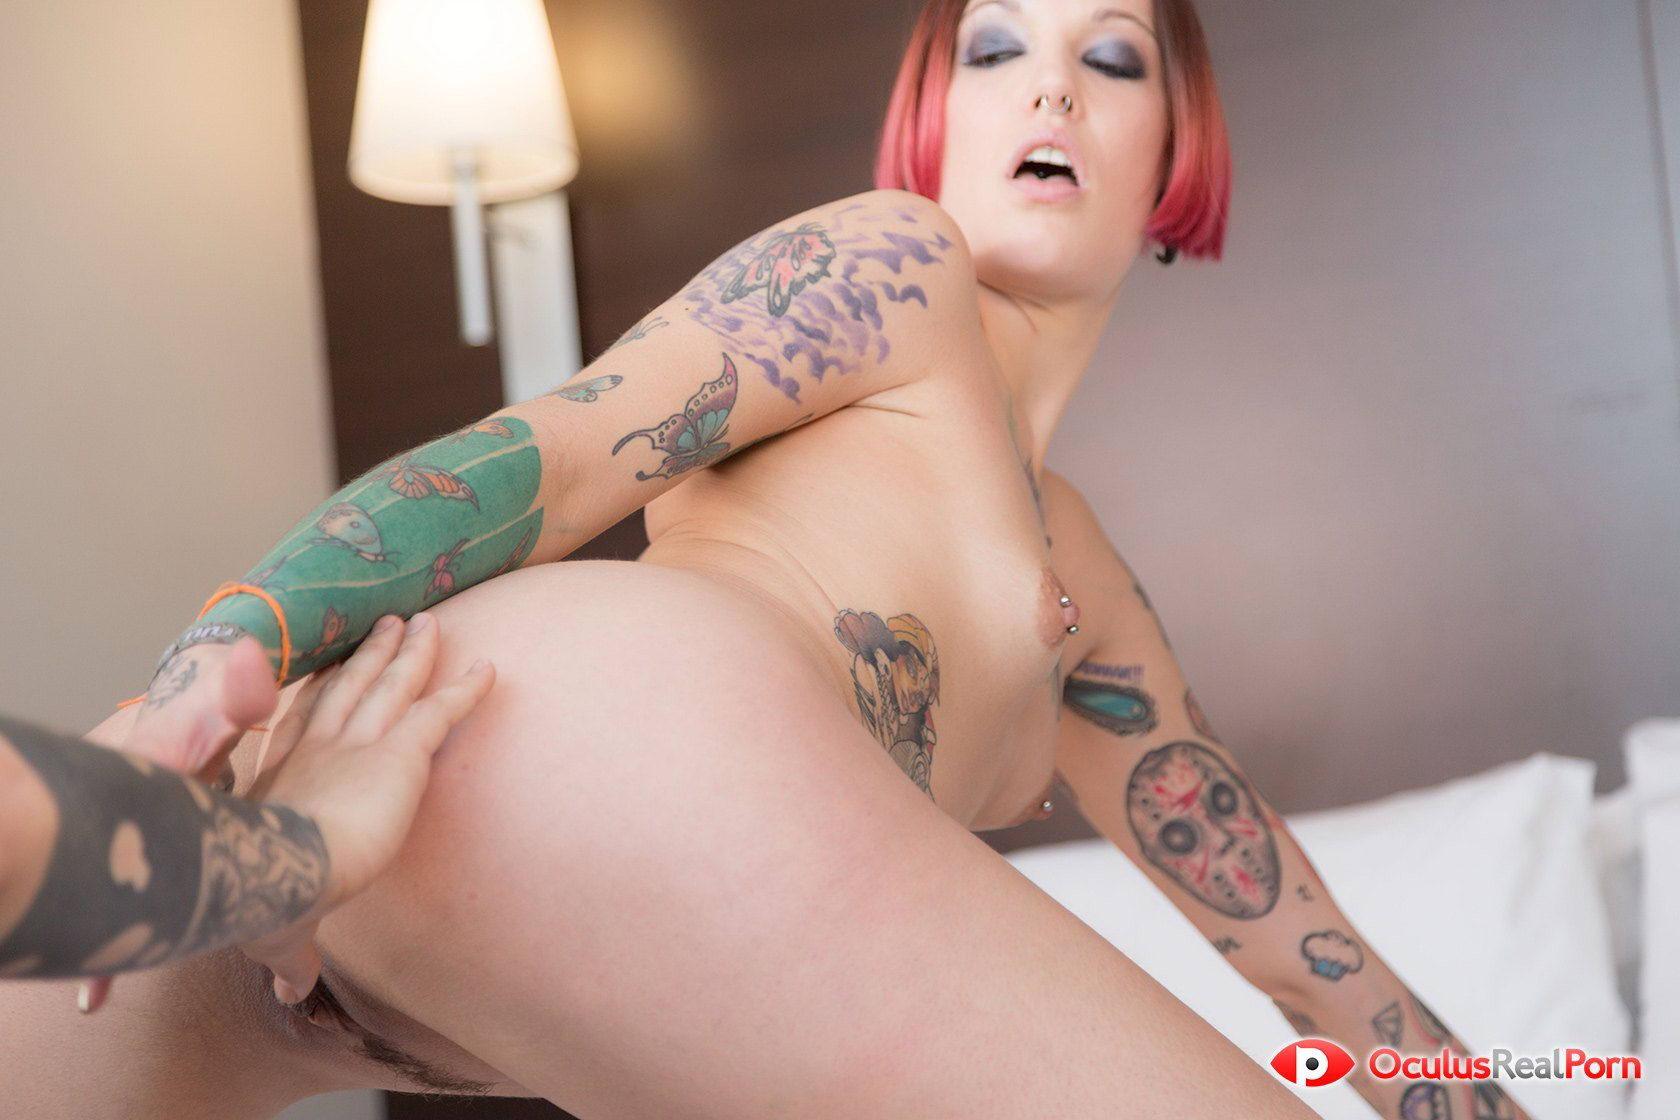 tattoed chicks having sex nude